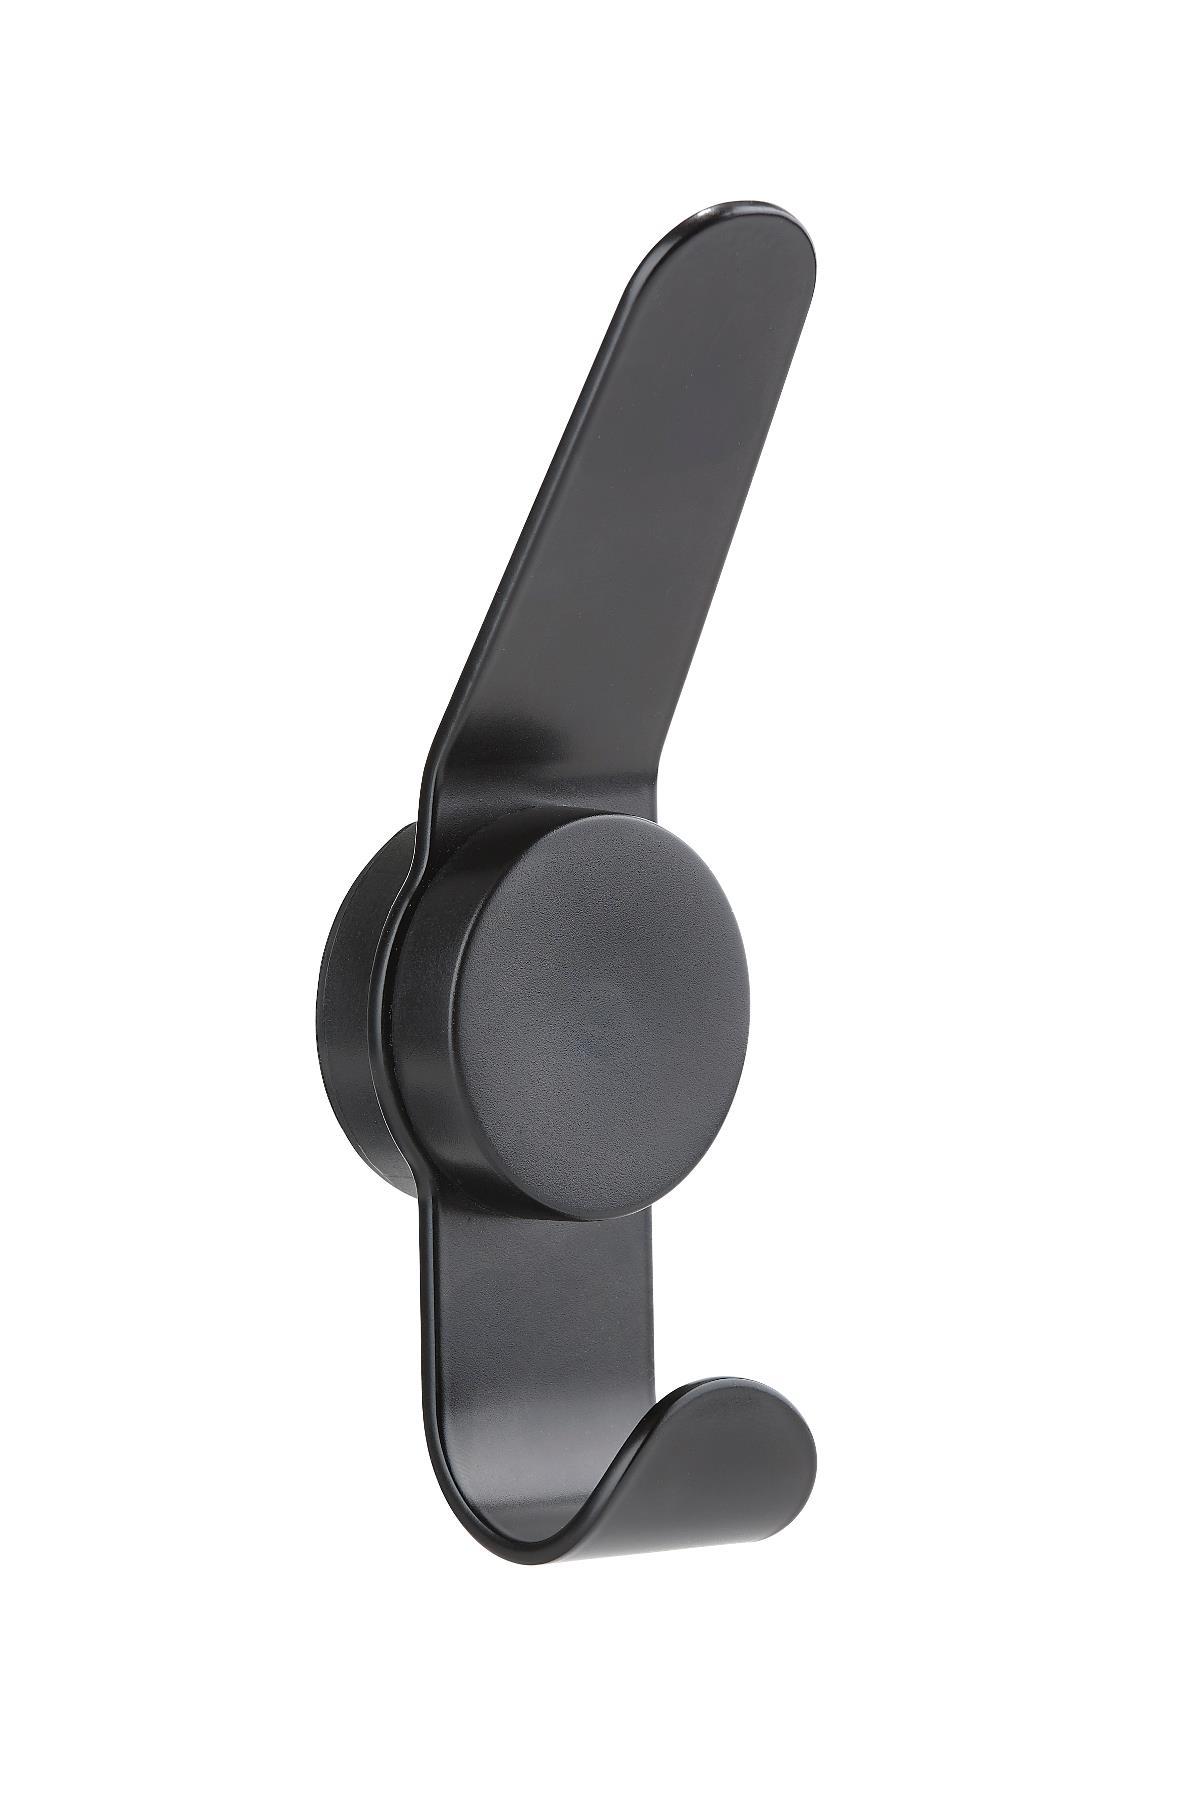 Zone - Puck Hook Double - Black (330255)